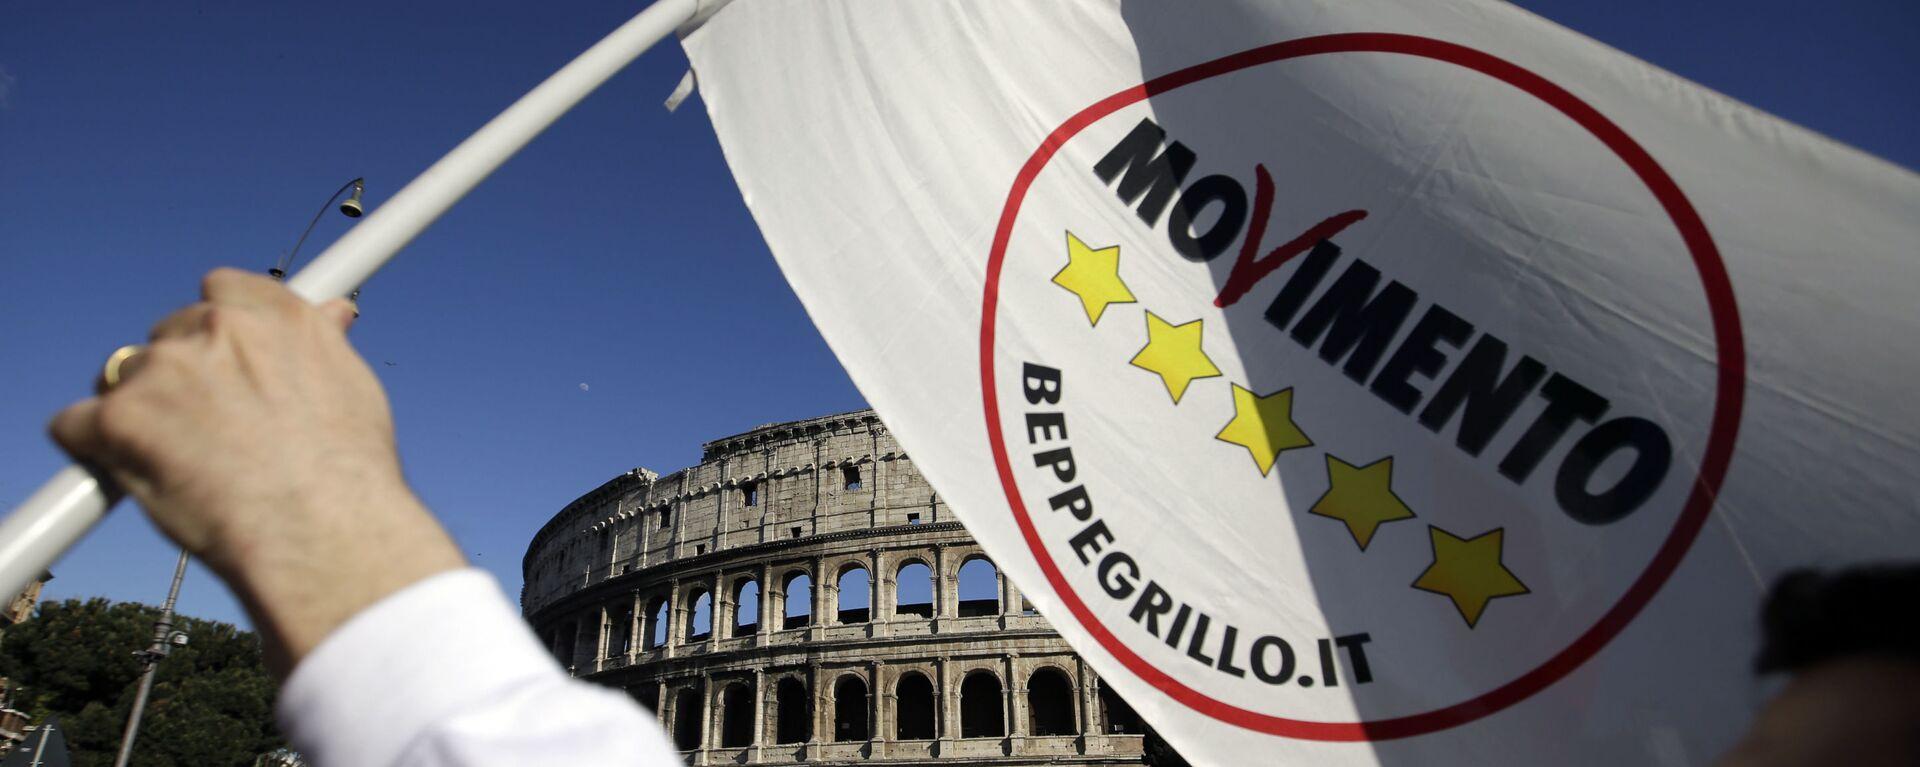 MoVimento 5 stelle - Sputnik Italia, 1920, 16.02.2021